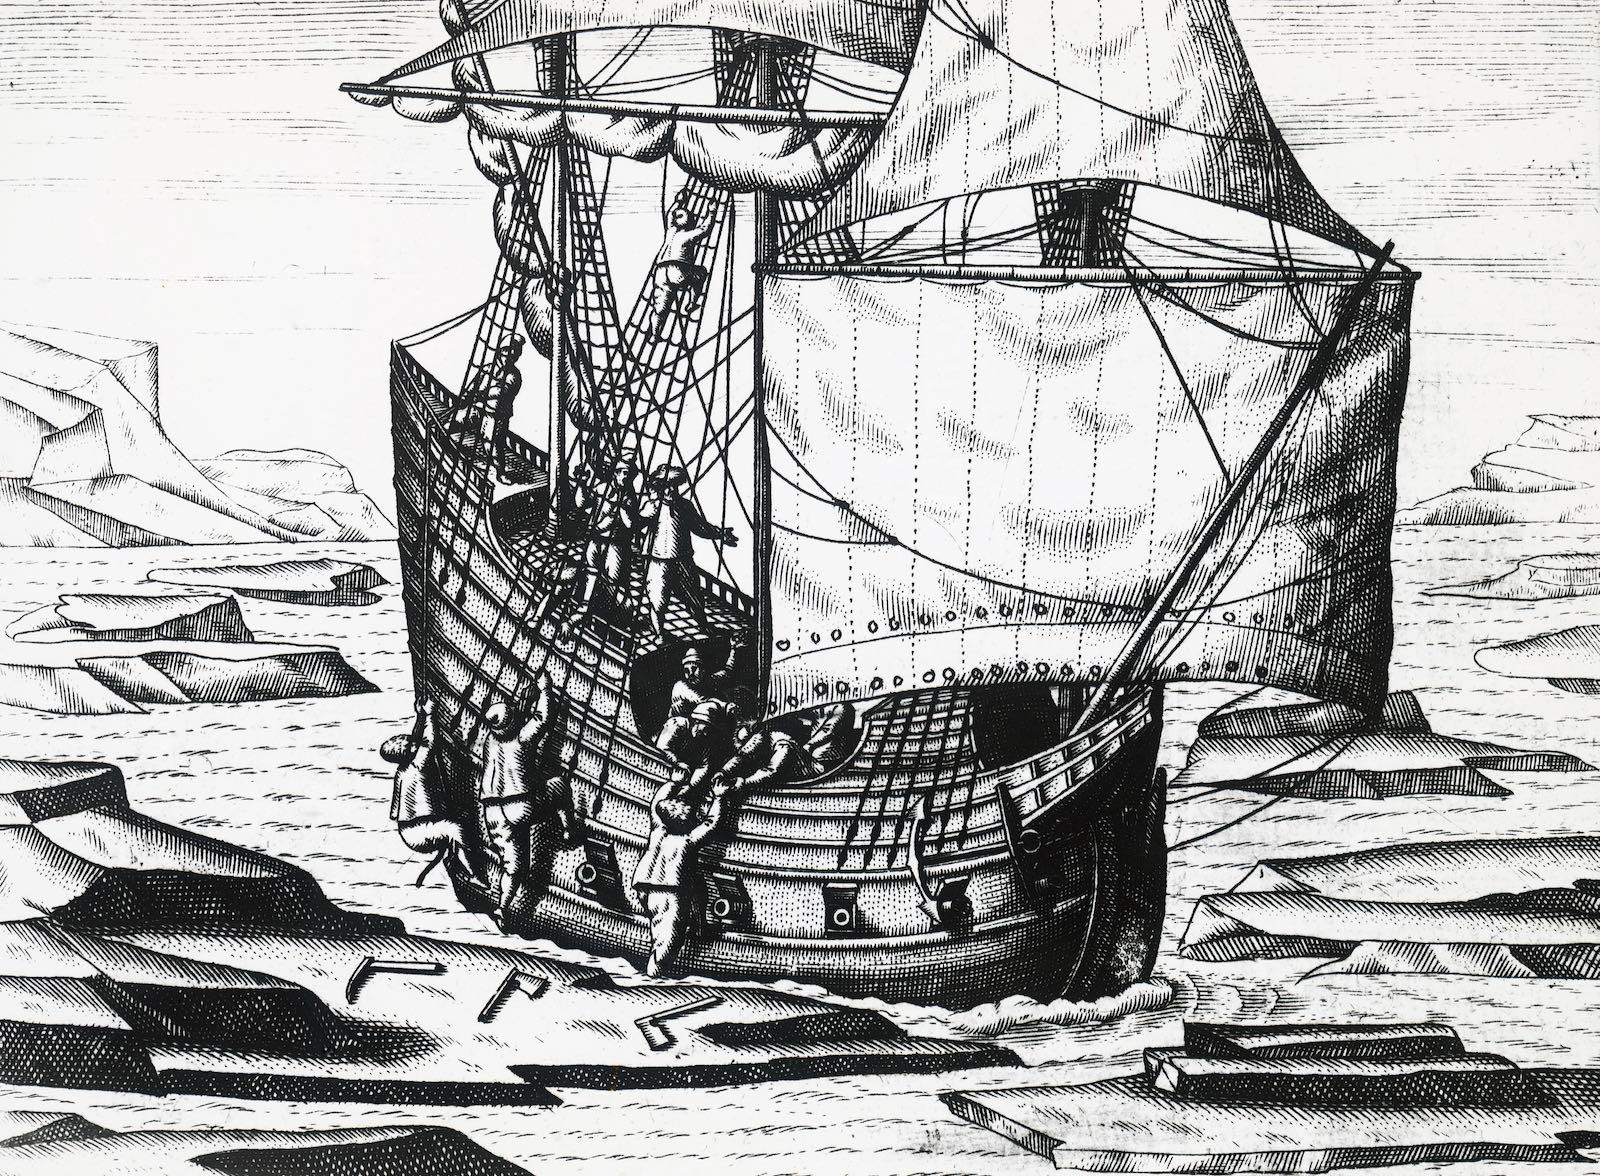 Sailors aboard Barents's ship